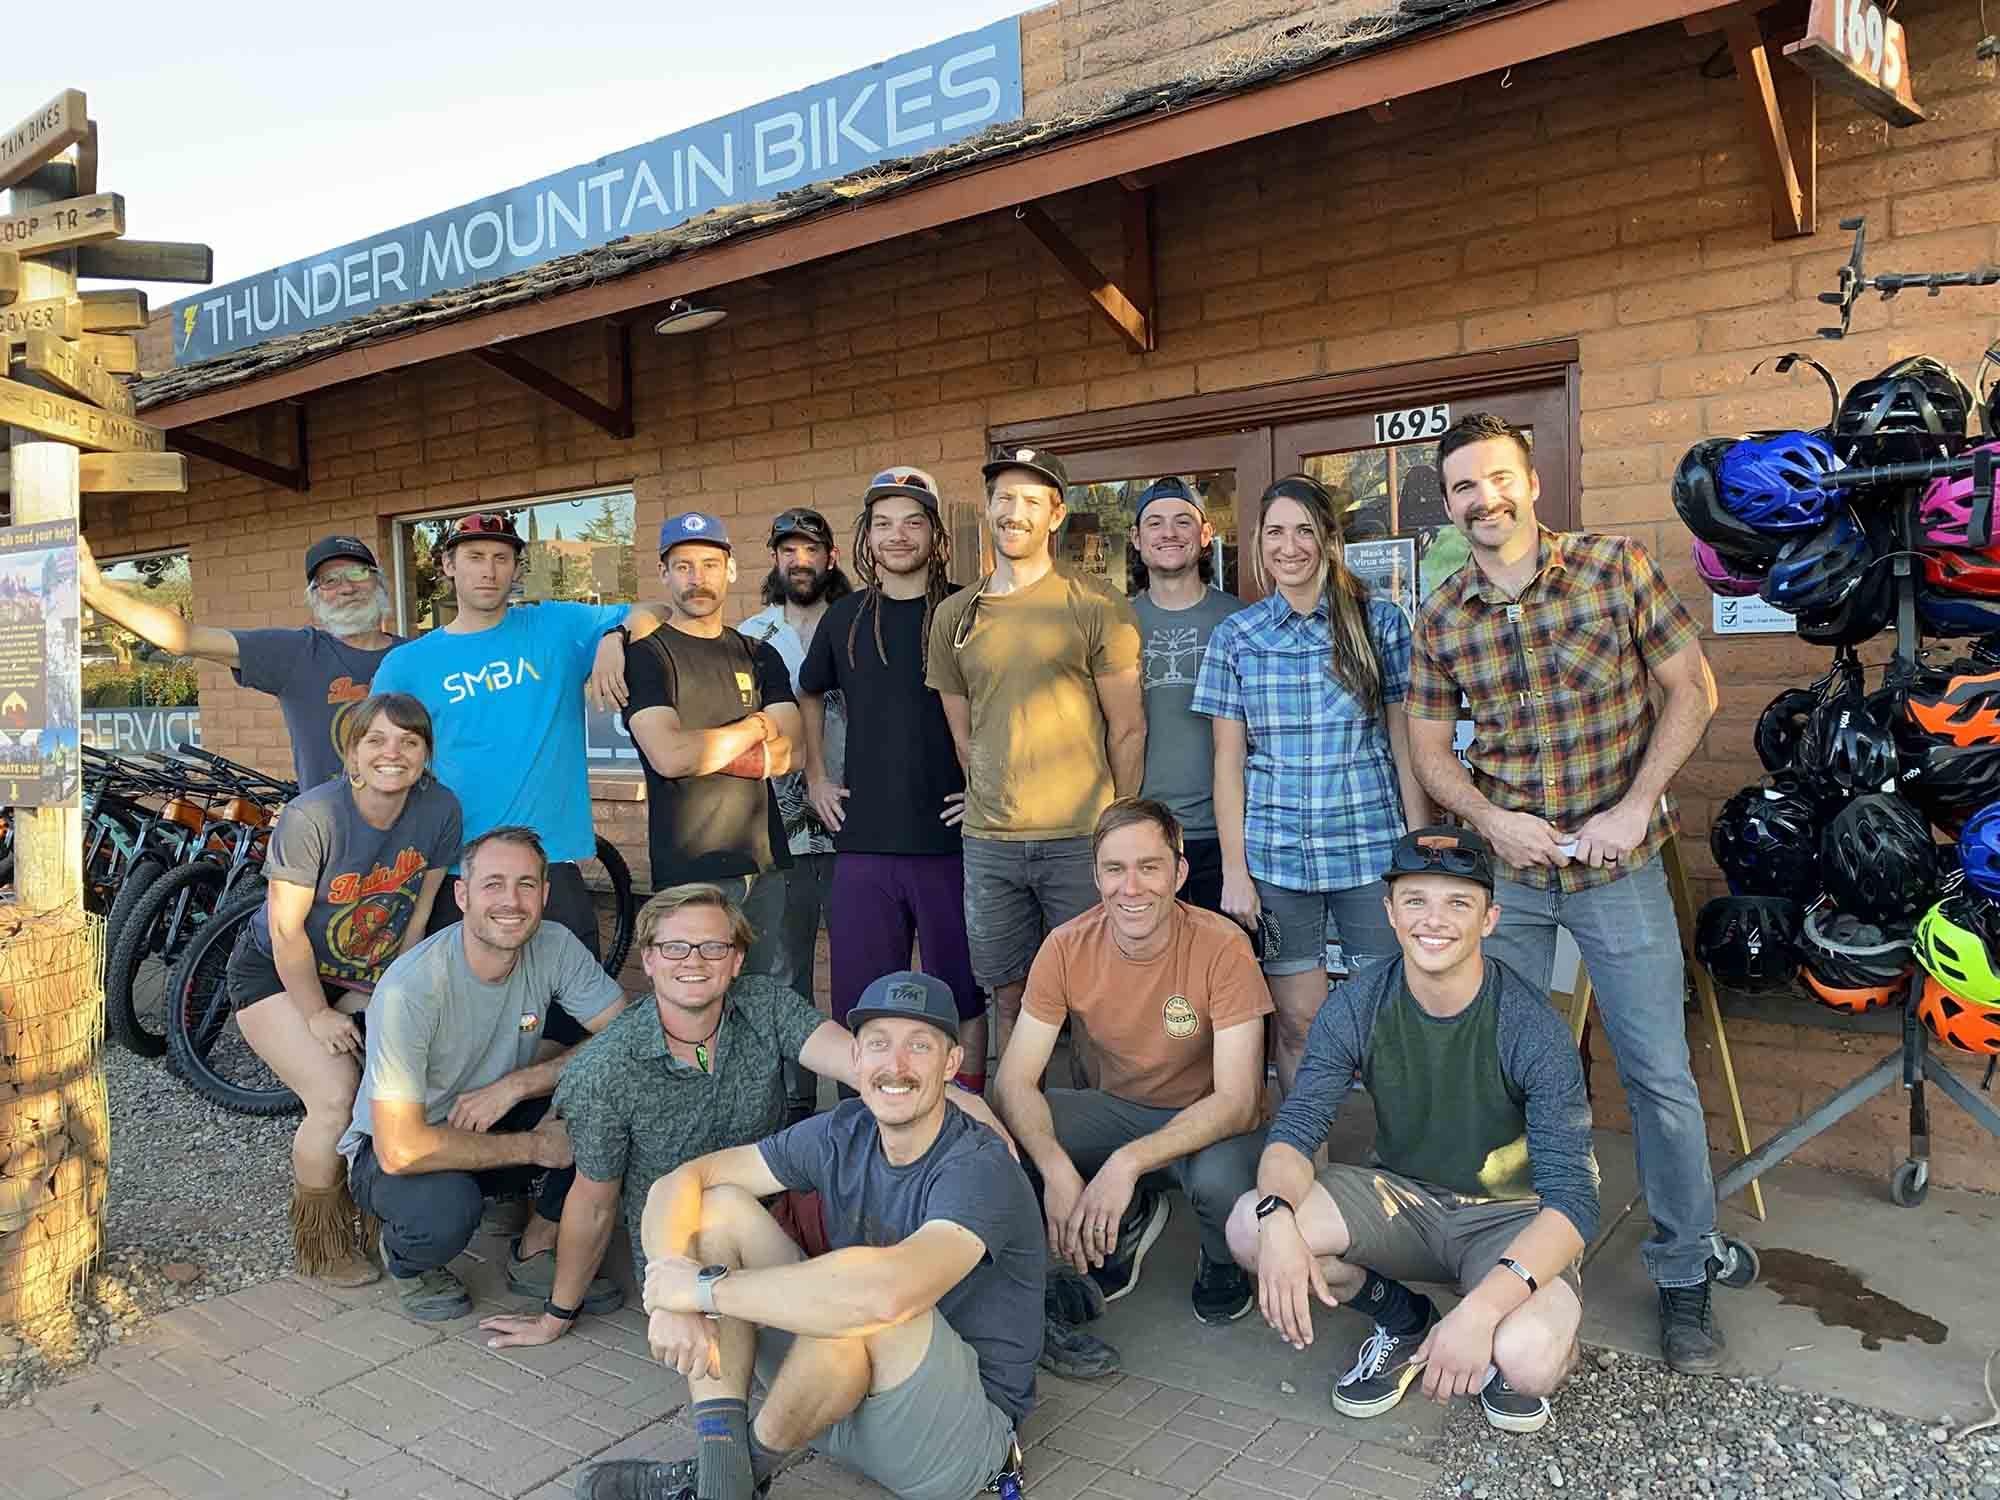 Meet the Thunder Mountain Bike Team in Sedona, Arizona